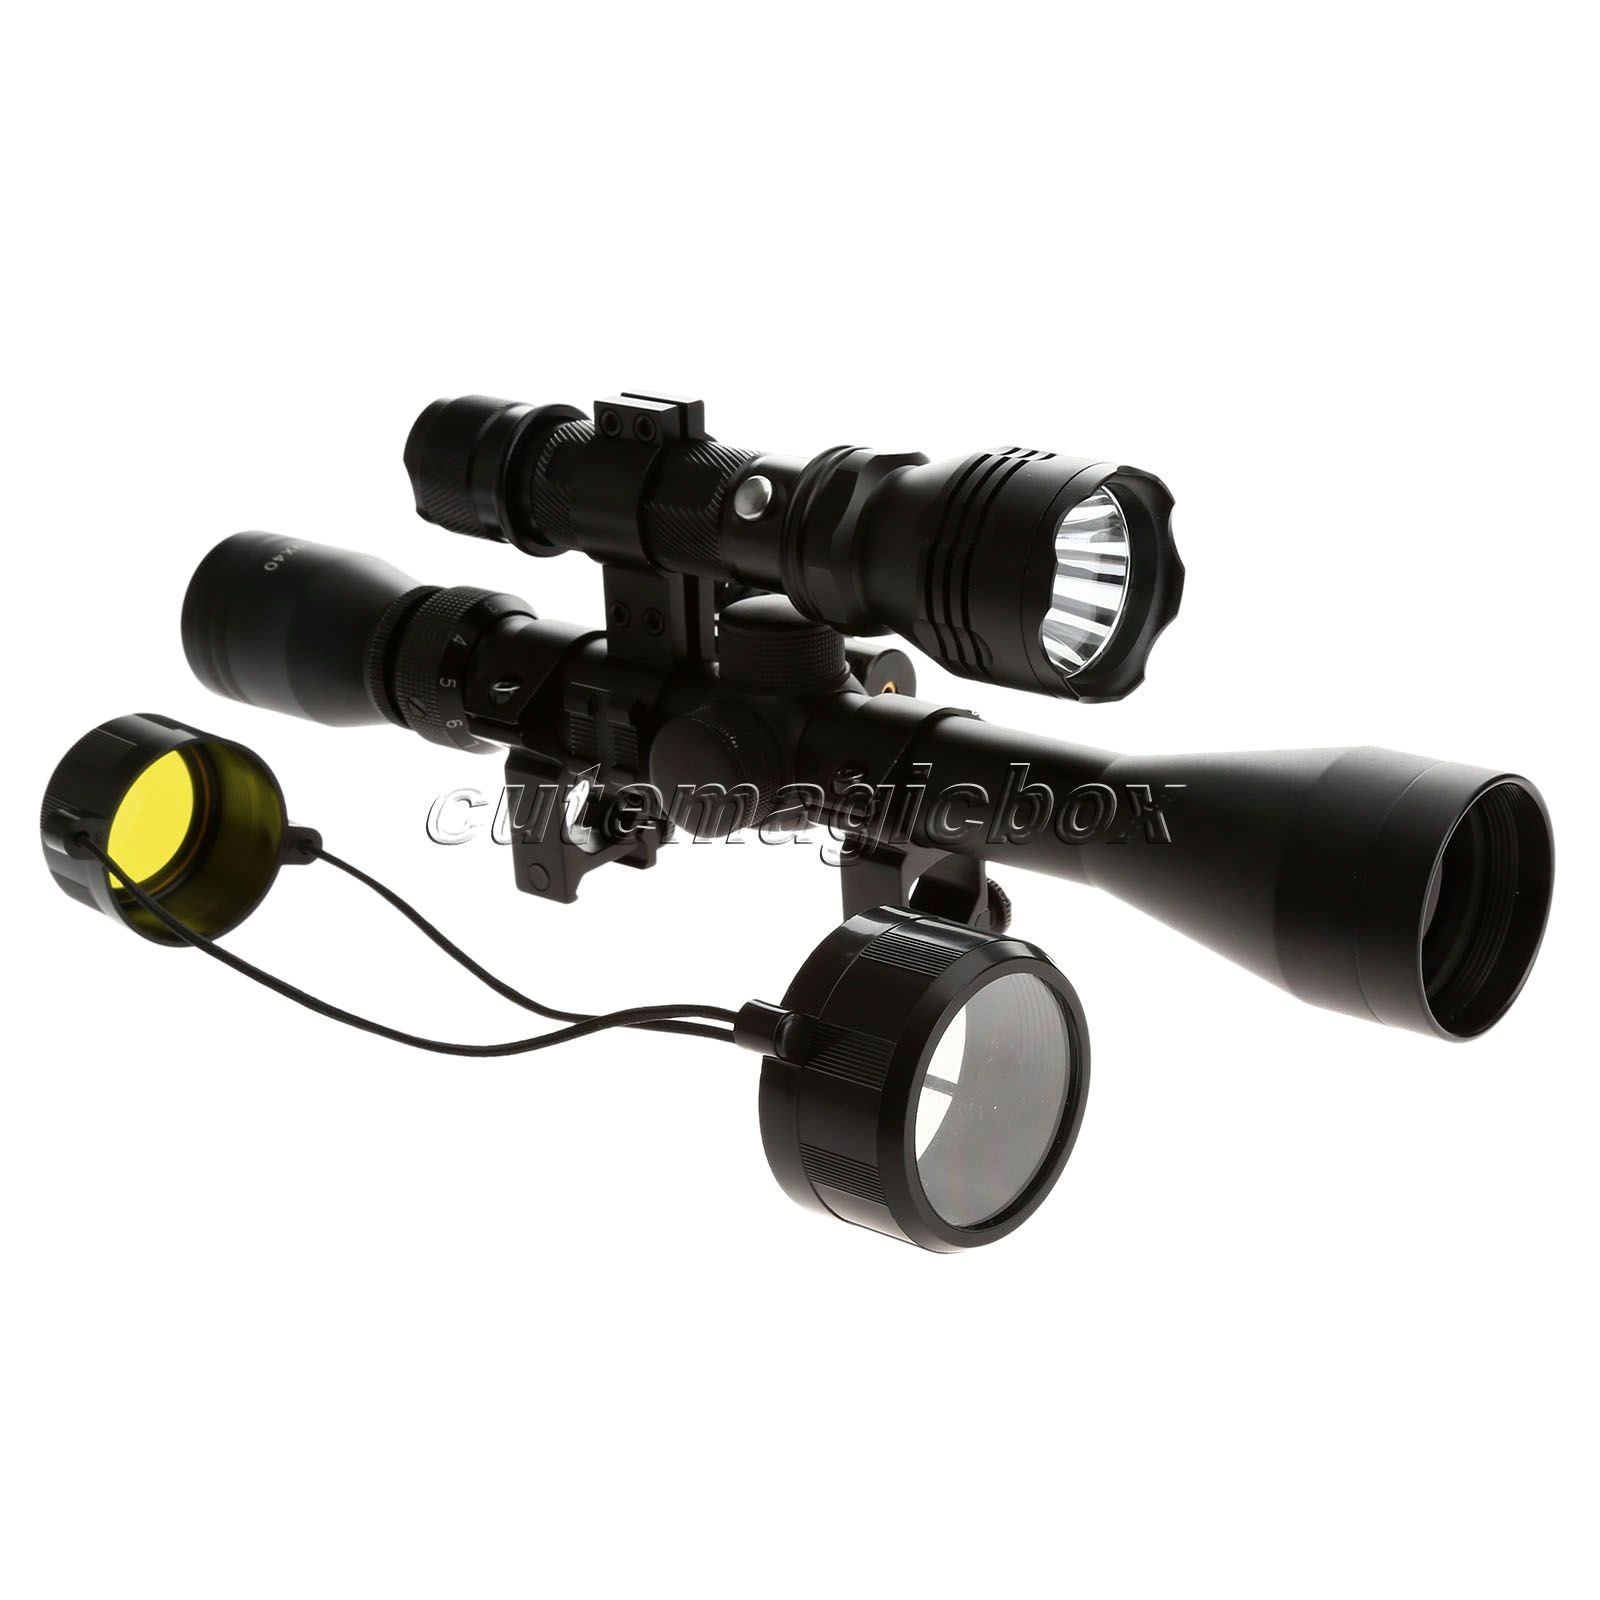 ФОТО Tactical 1 set Optical Sight Rifle Scope 3-9 X40 Hunting Mount Red Dot Laser Sight Black Single Mode Flashlight Hunting Shooting